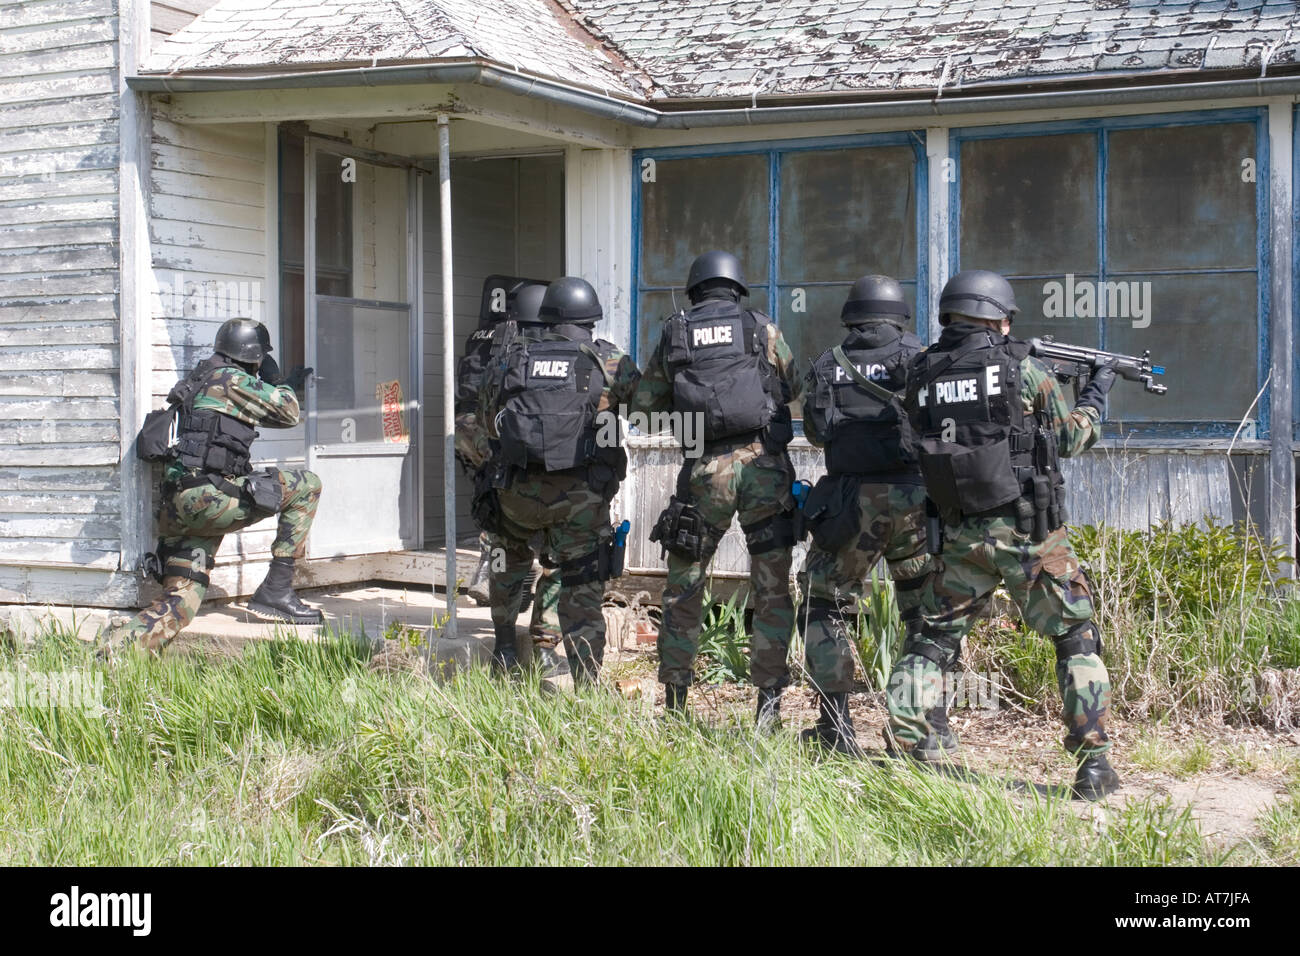 Swat Teams Training In Rural Nebraska Stock Photo 5297913 Alamy